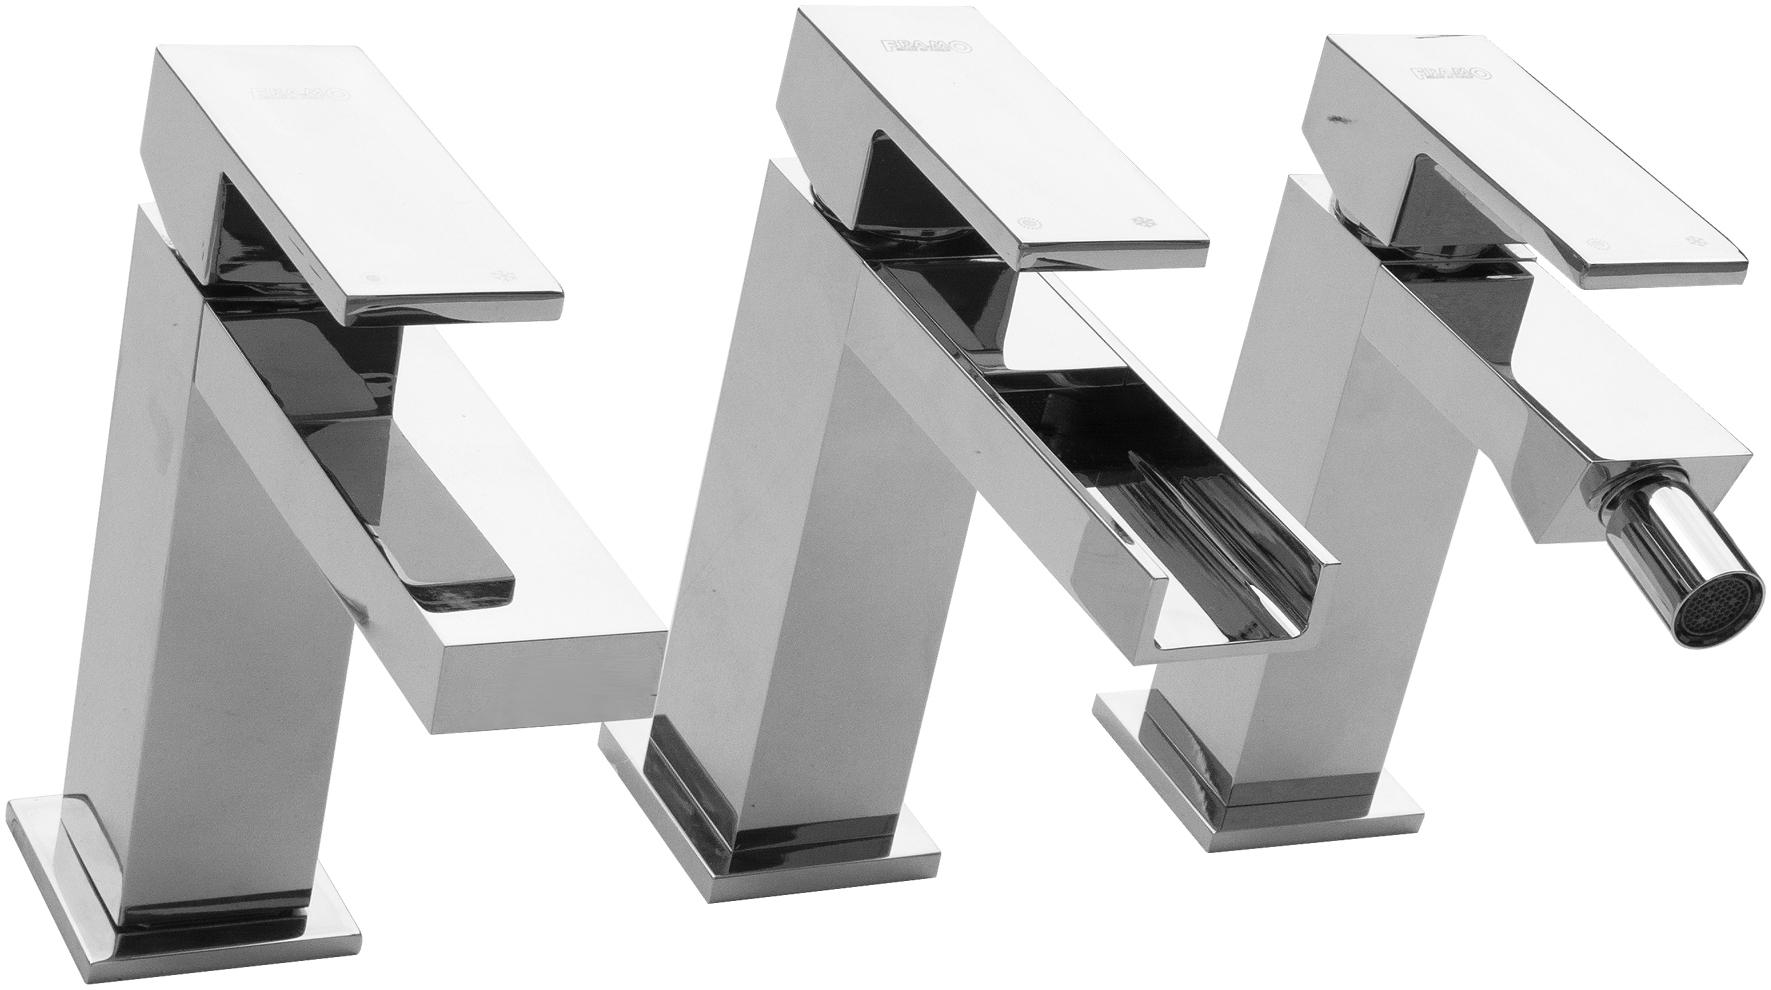 Miscelatore > Lavabo > UPPER > Prolunga 15 cm